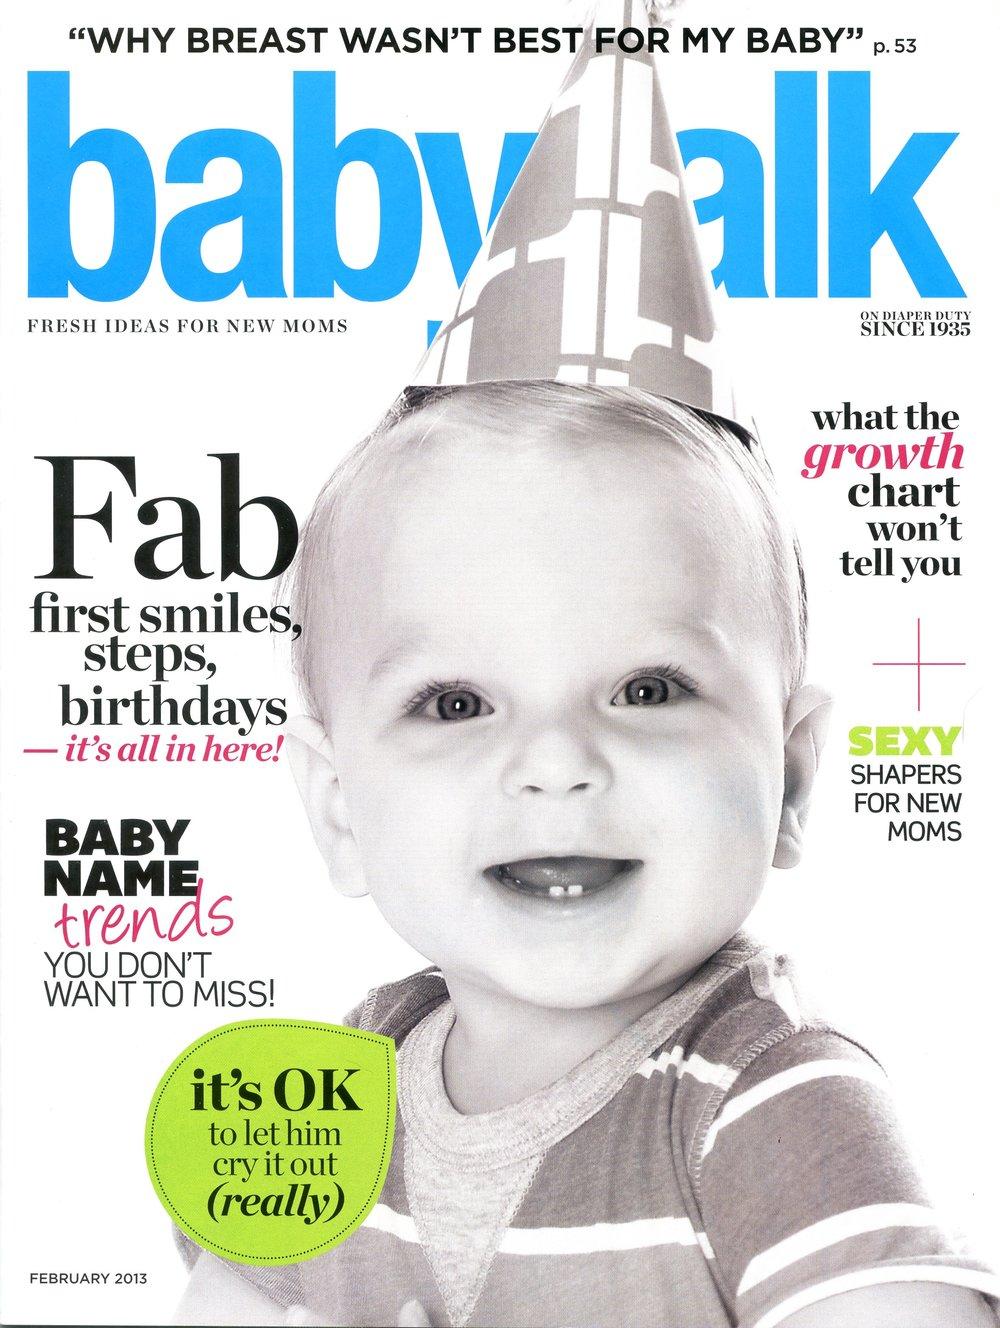 Babytalk006.jpg